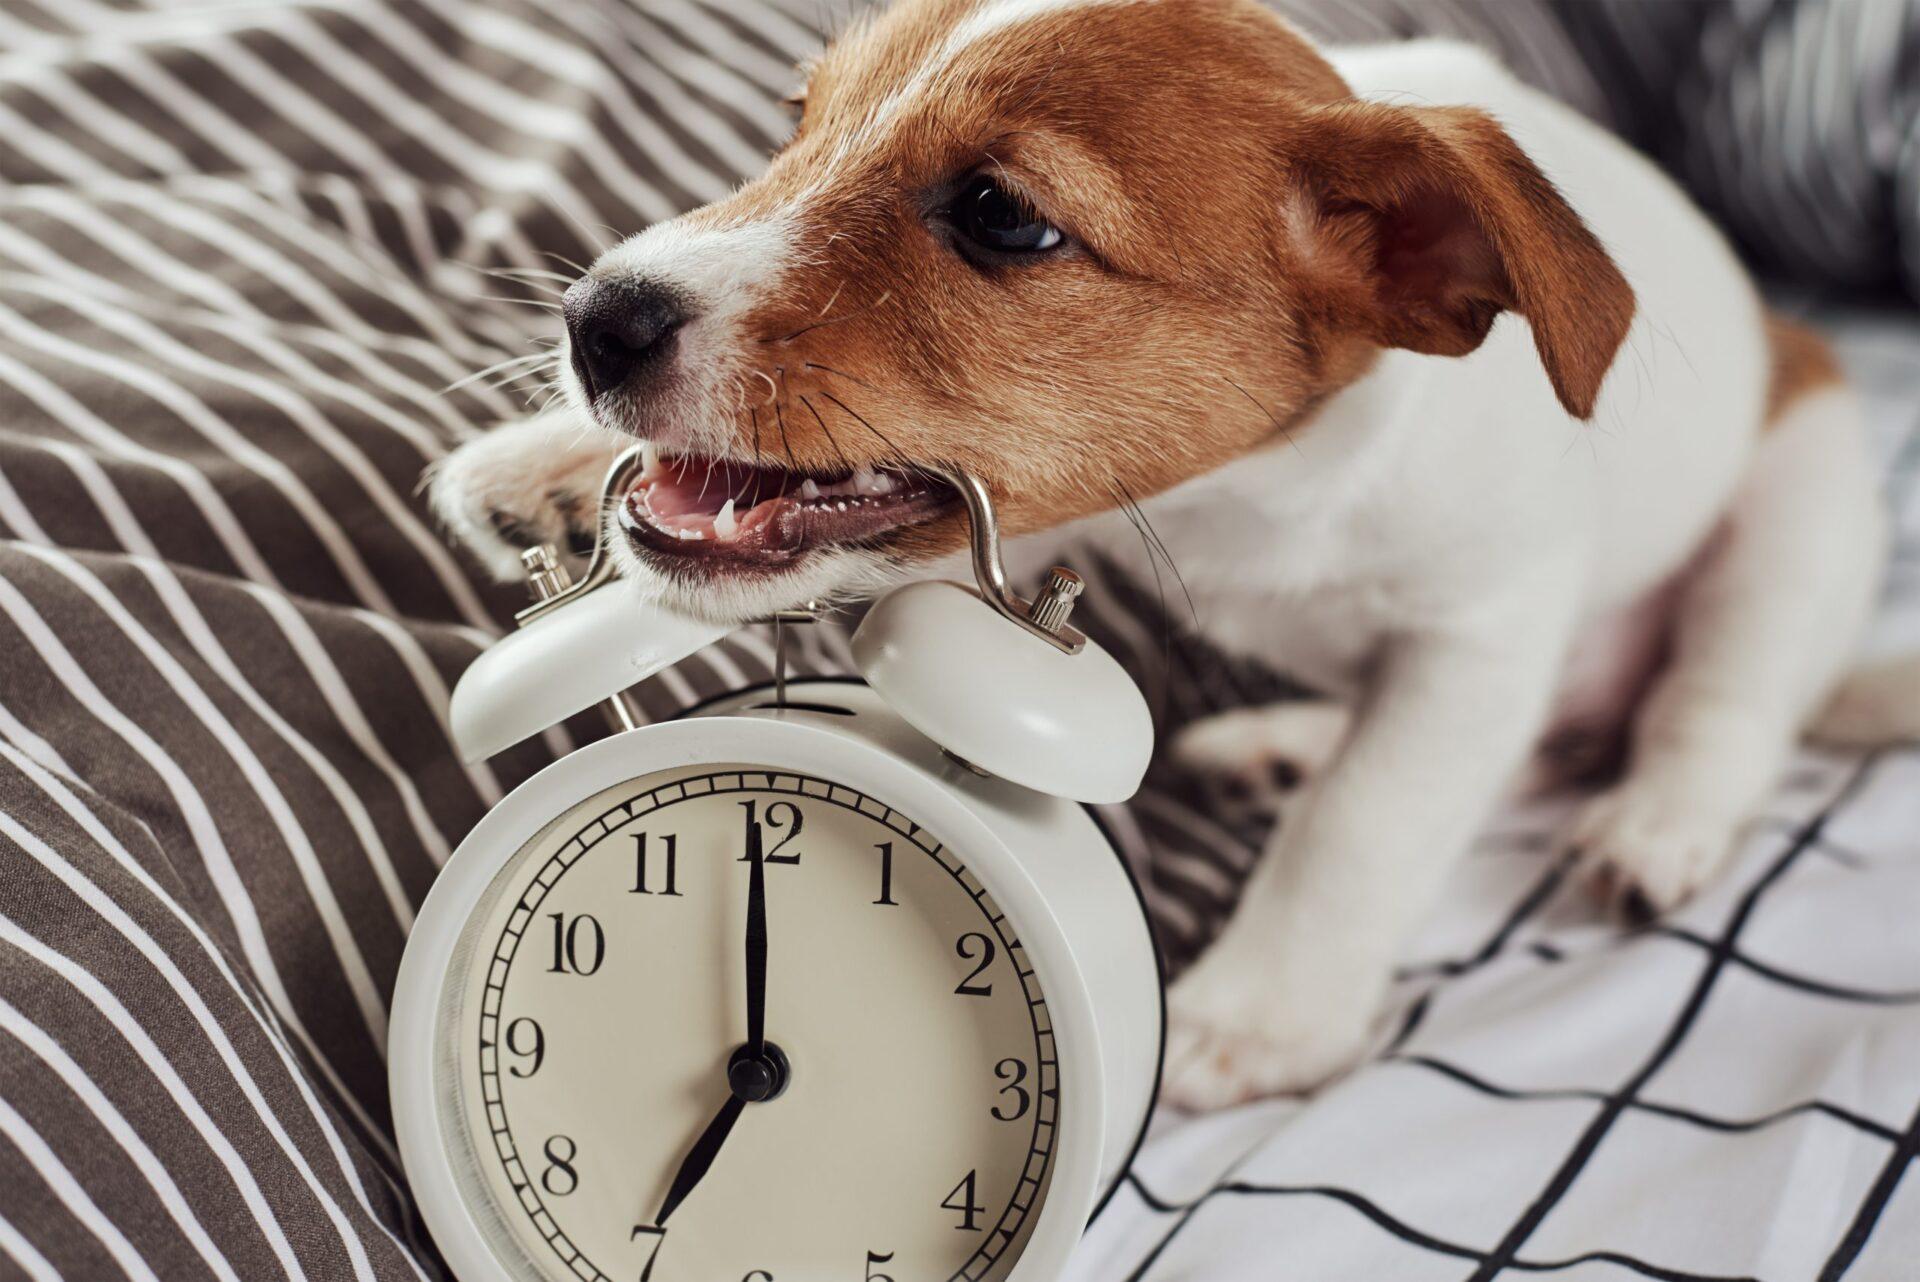 Jak oduczyć psa gryzienia? Jack russel terrier gryzie zegarek